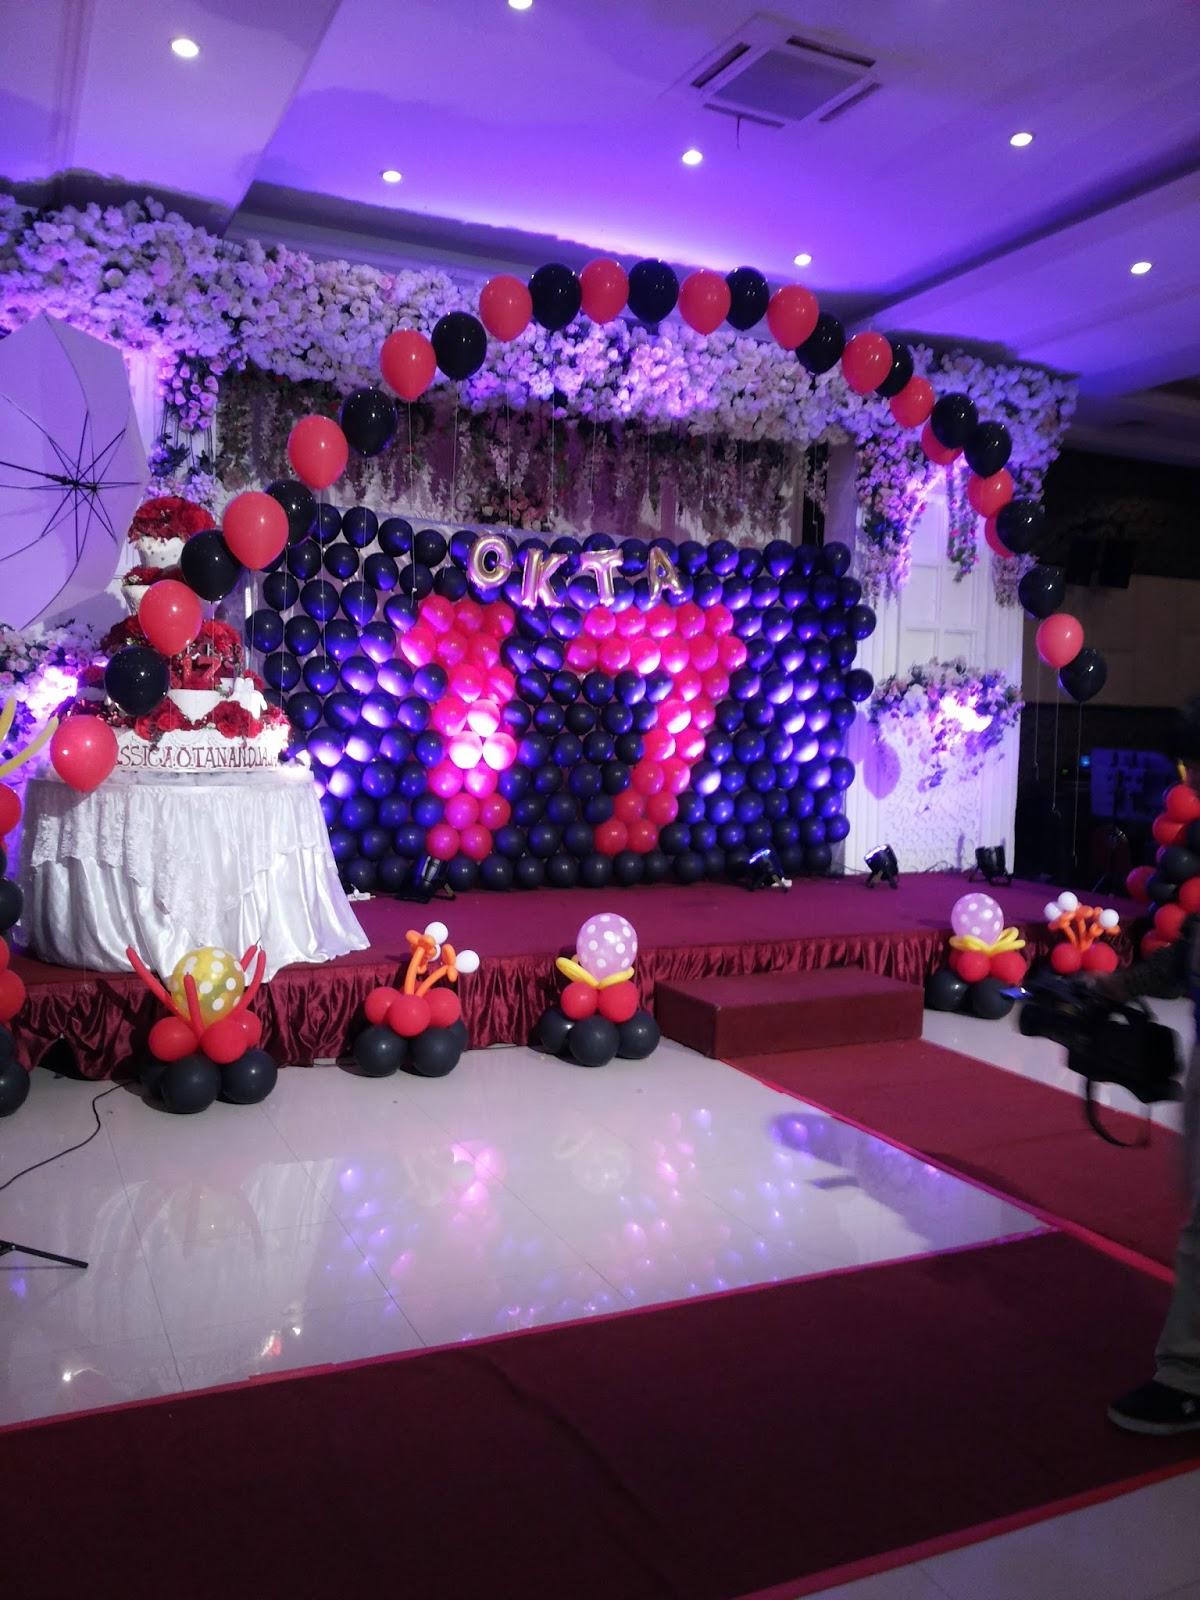 Dekorasi balon surabaya for Dekor ulang tahun